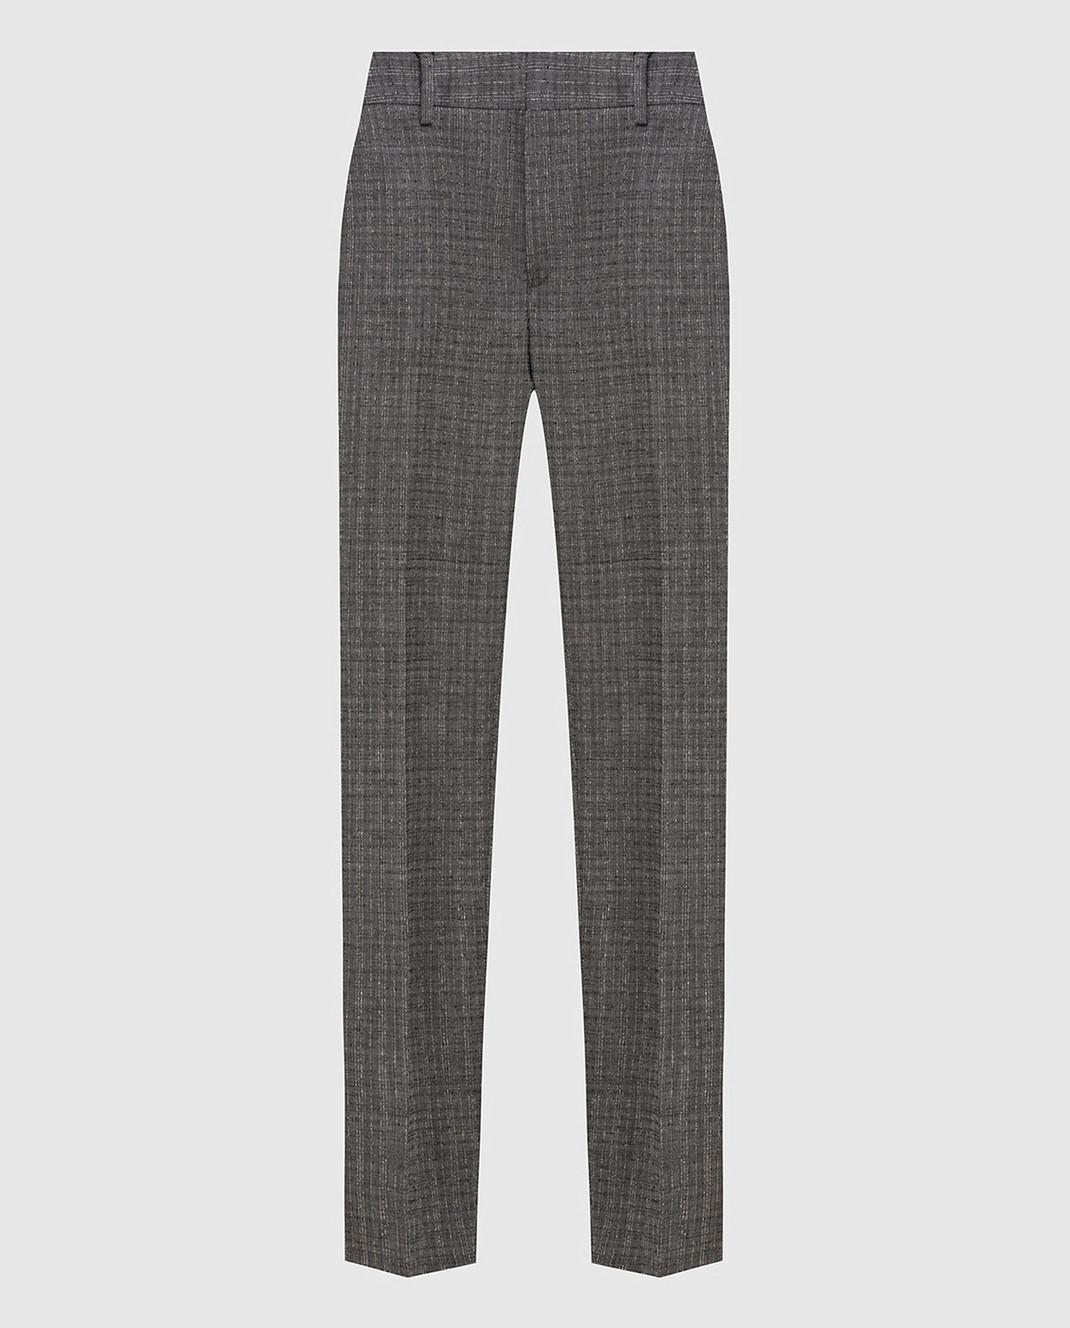 Saint Laurent Серые брюки из шерсти и мохера 502533Y083S